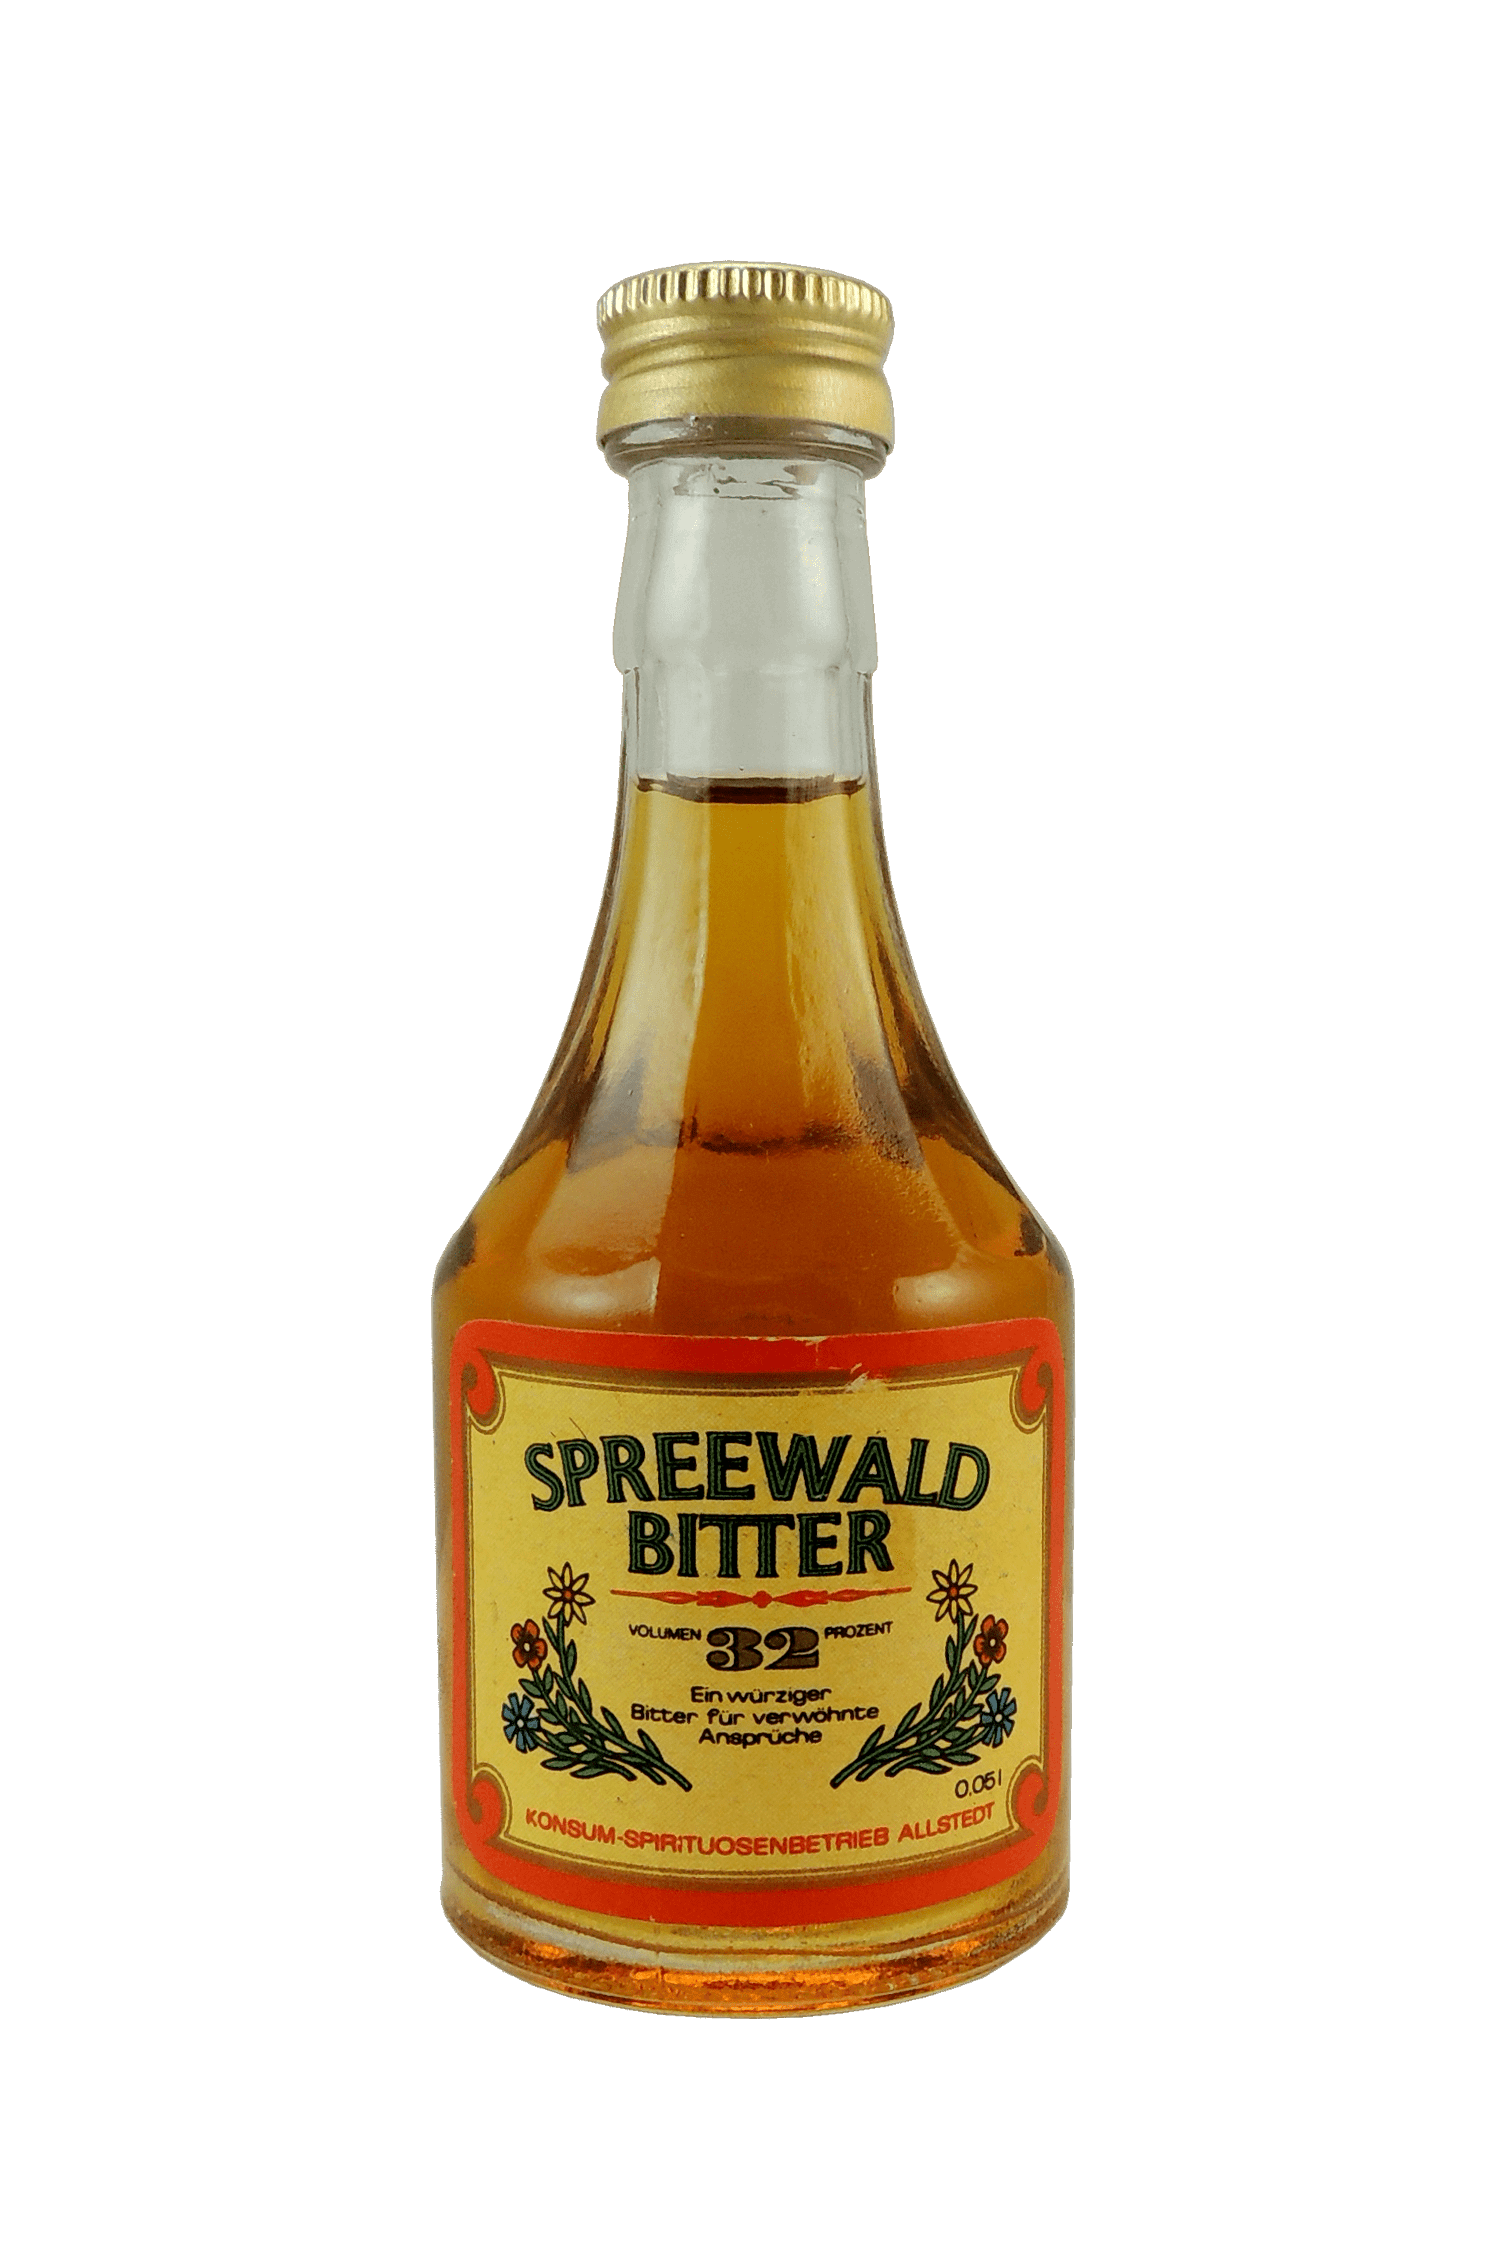 Spreewald Bitter